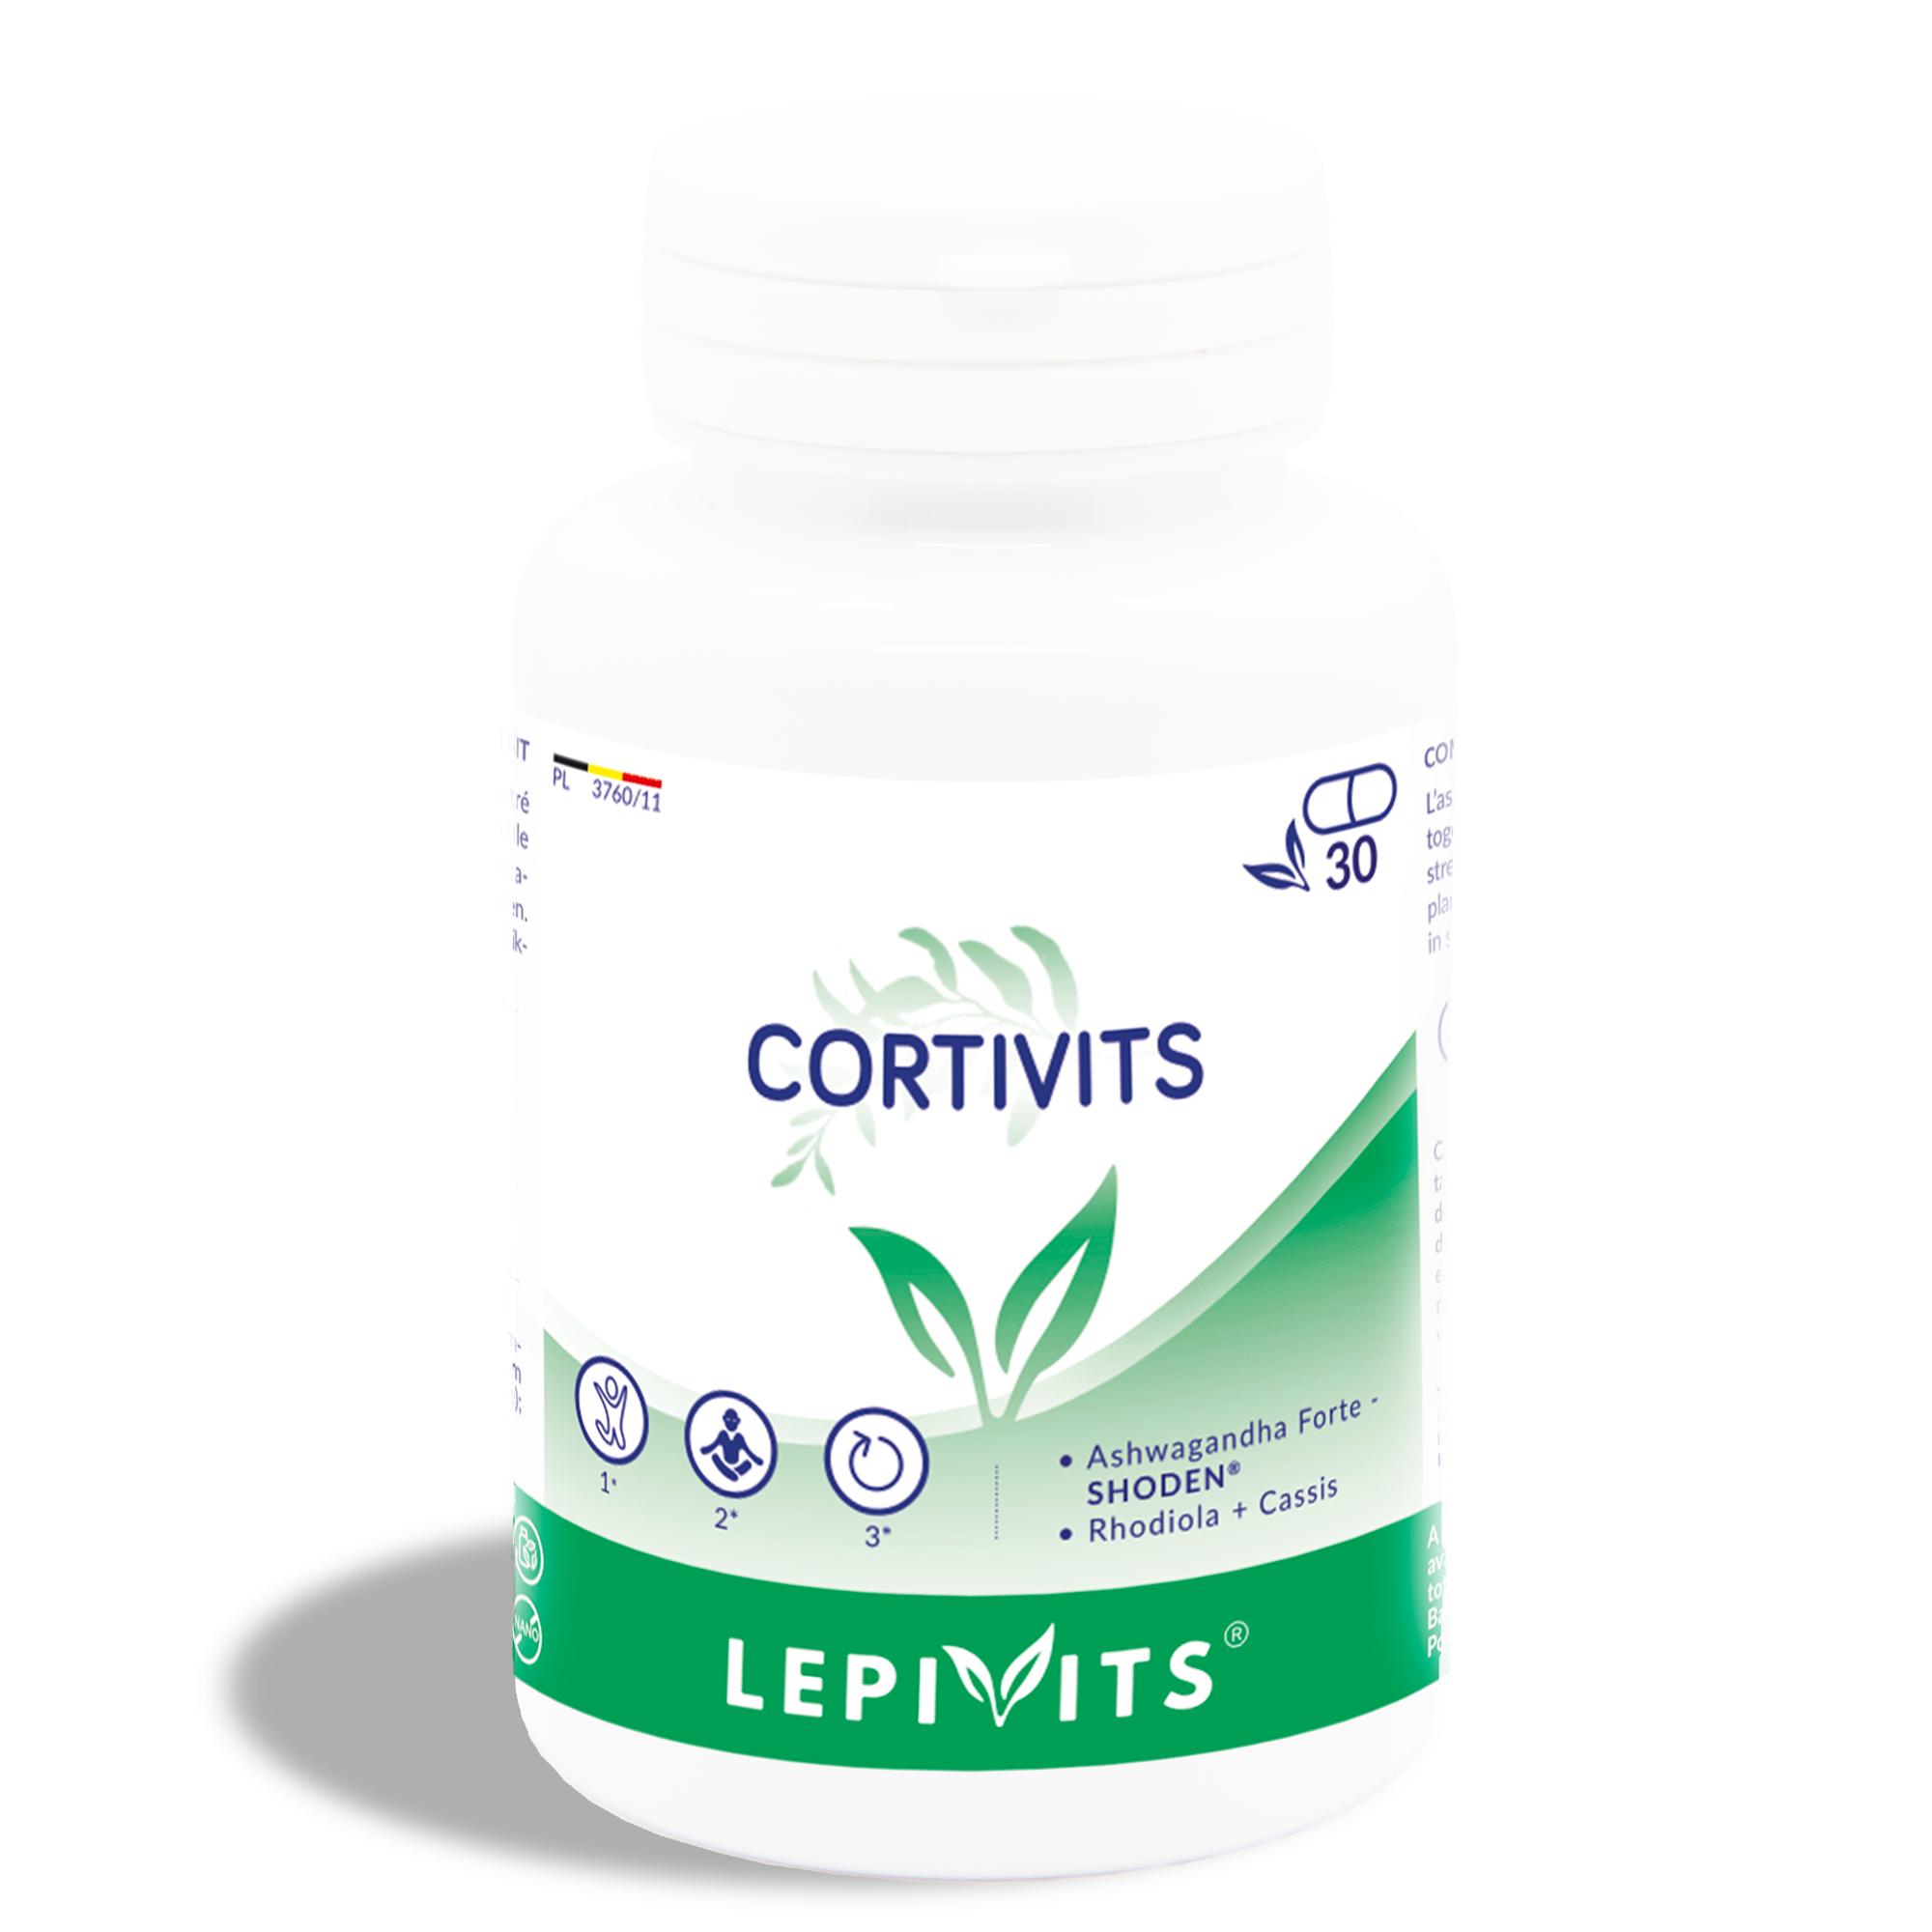 Cortivits